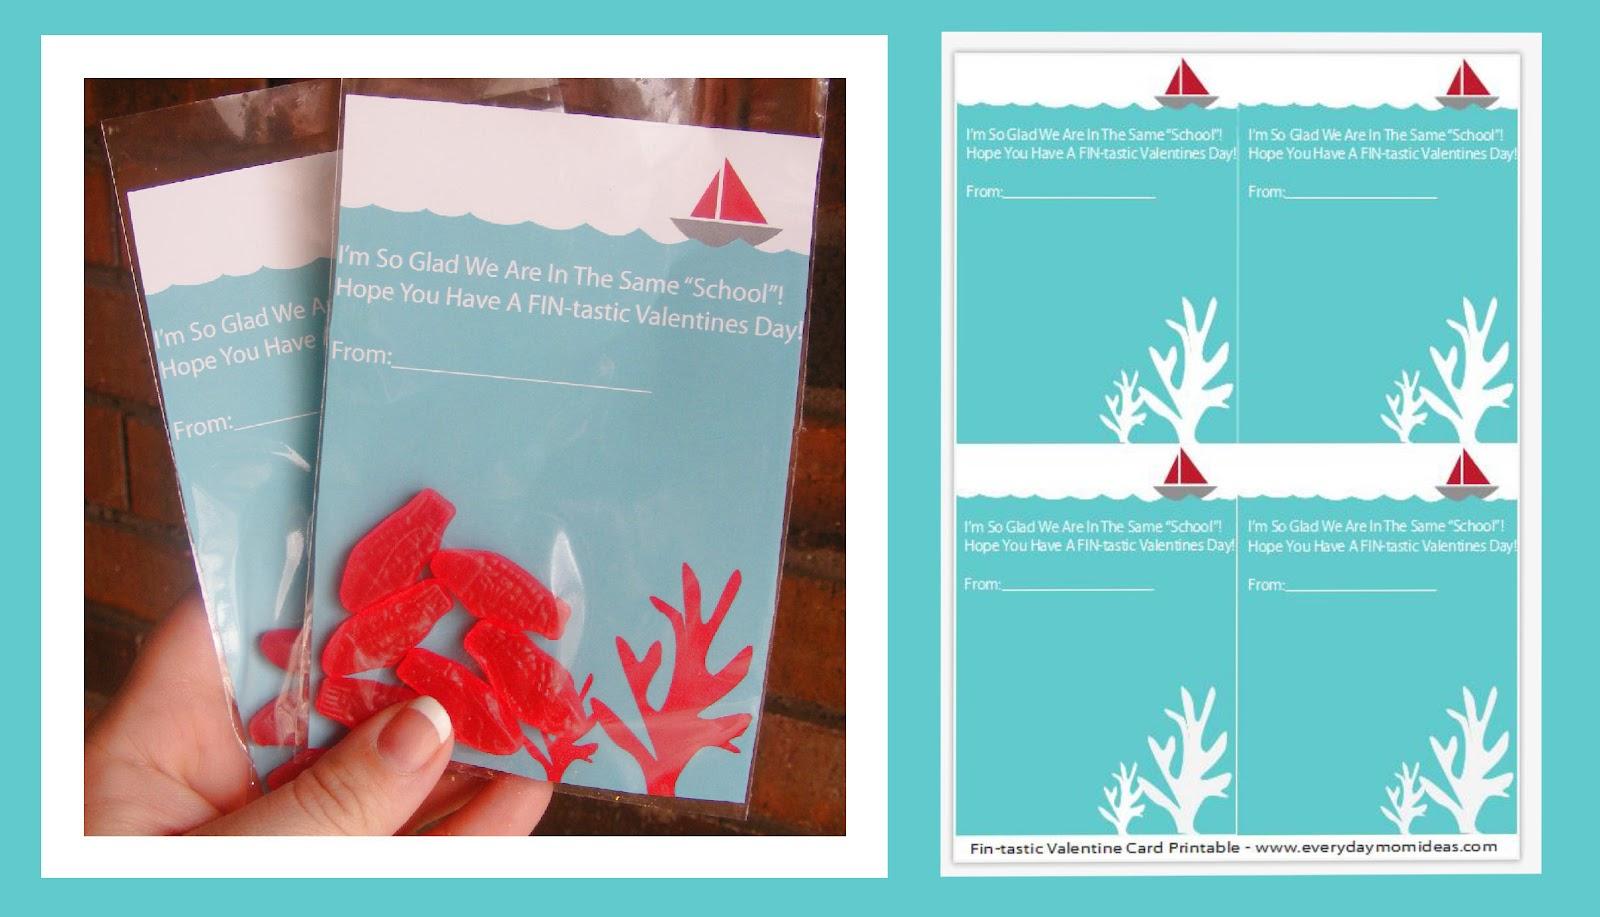 FIN-tastic Valentine Card Printable (FREE) - Everyday Mom Ideas